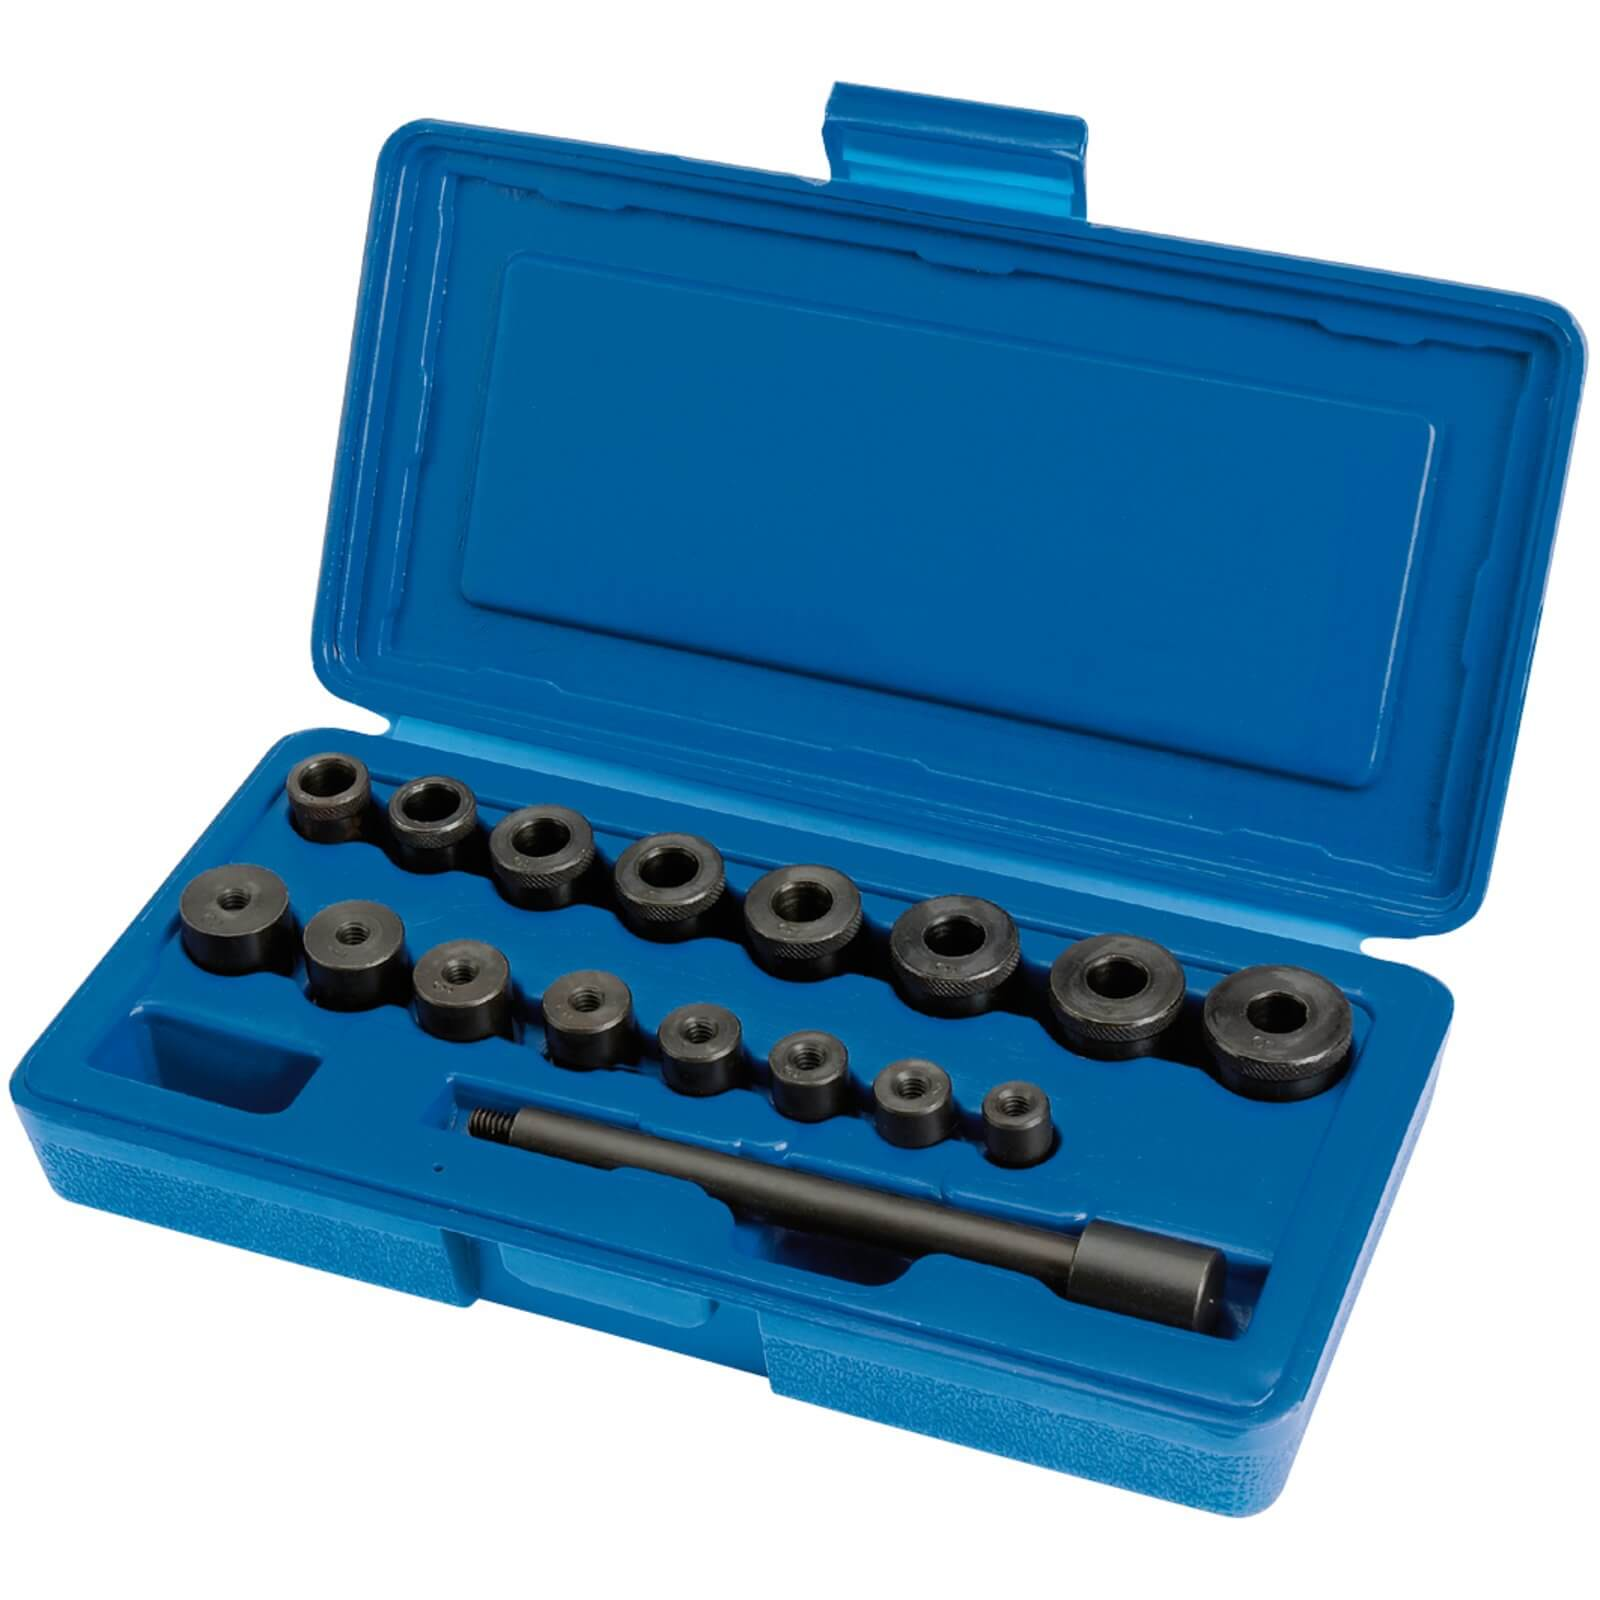 Image of Draper 17 Piece Universal Clutch Aligning Kit